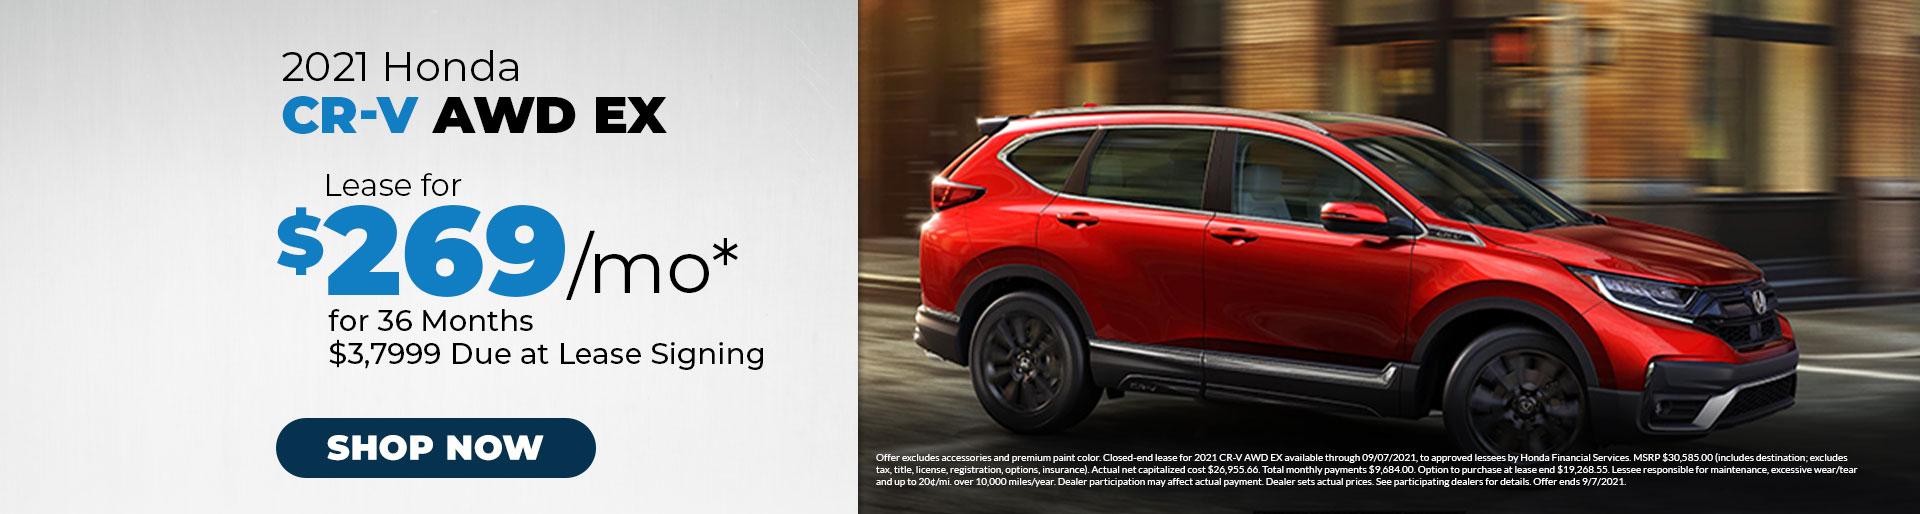 2021 Honda CR-V AWD EX Offer